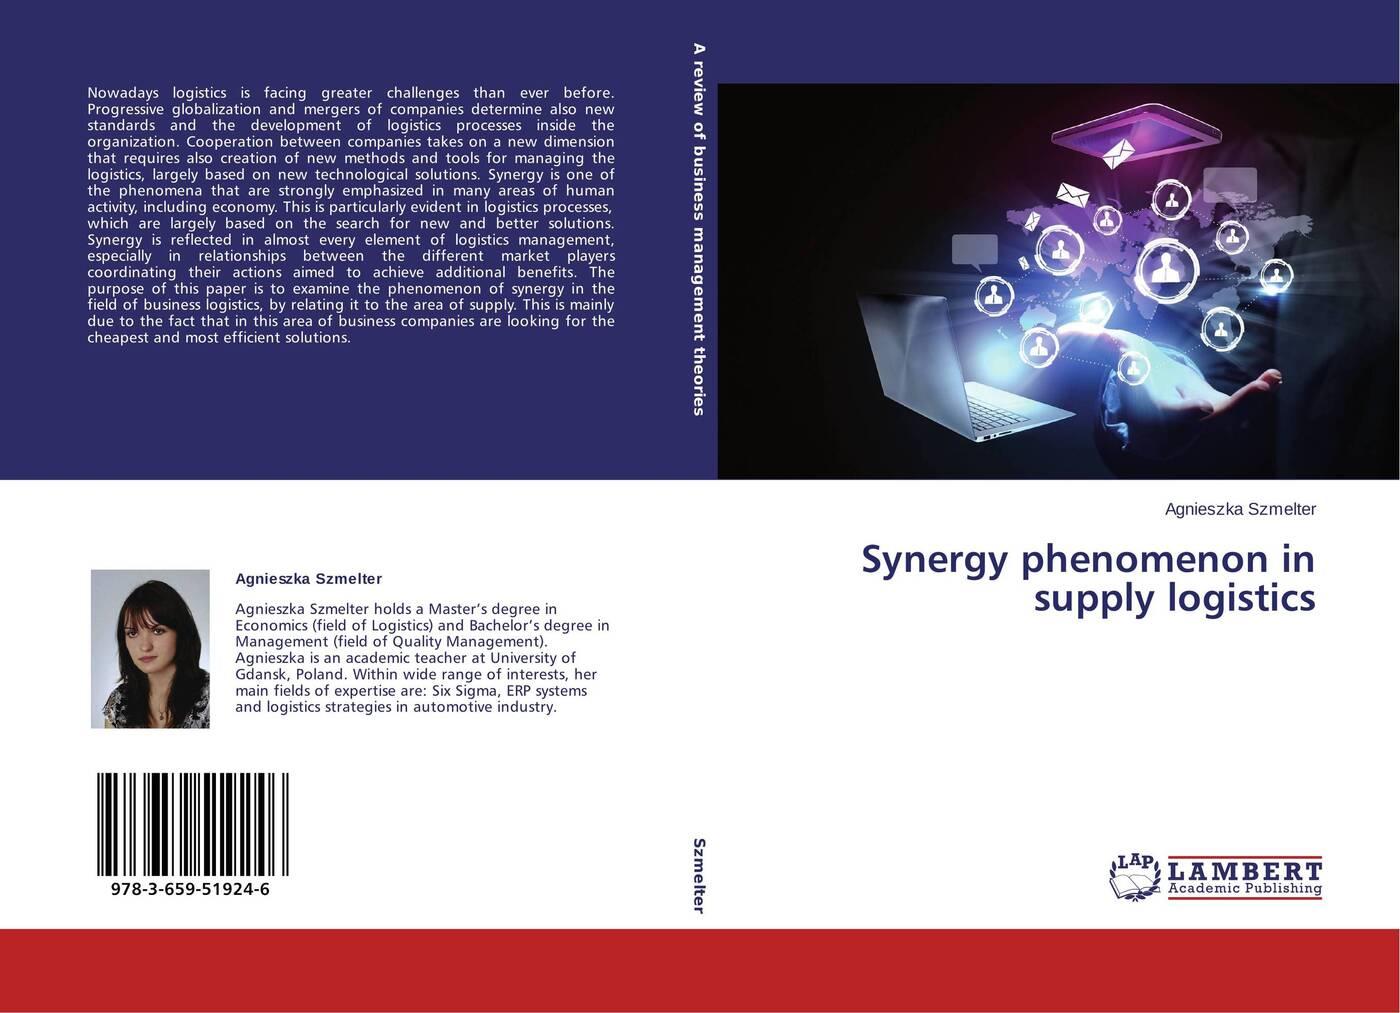 Agnieszka Szmelter Synergy phenomenon in supply logistics business logistics management